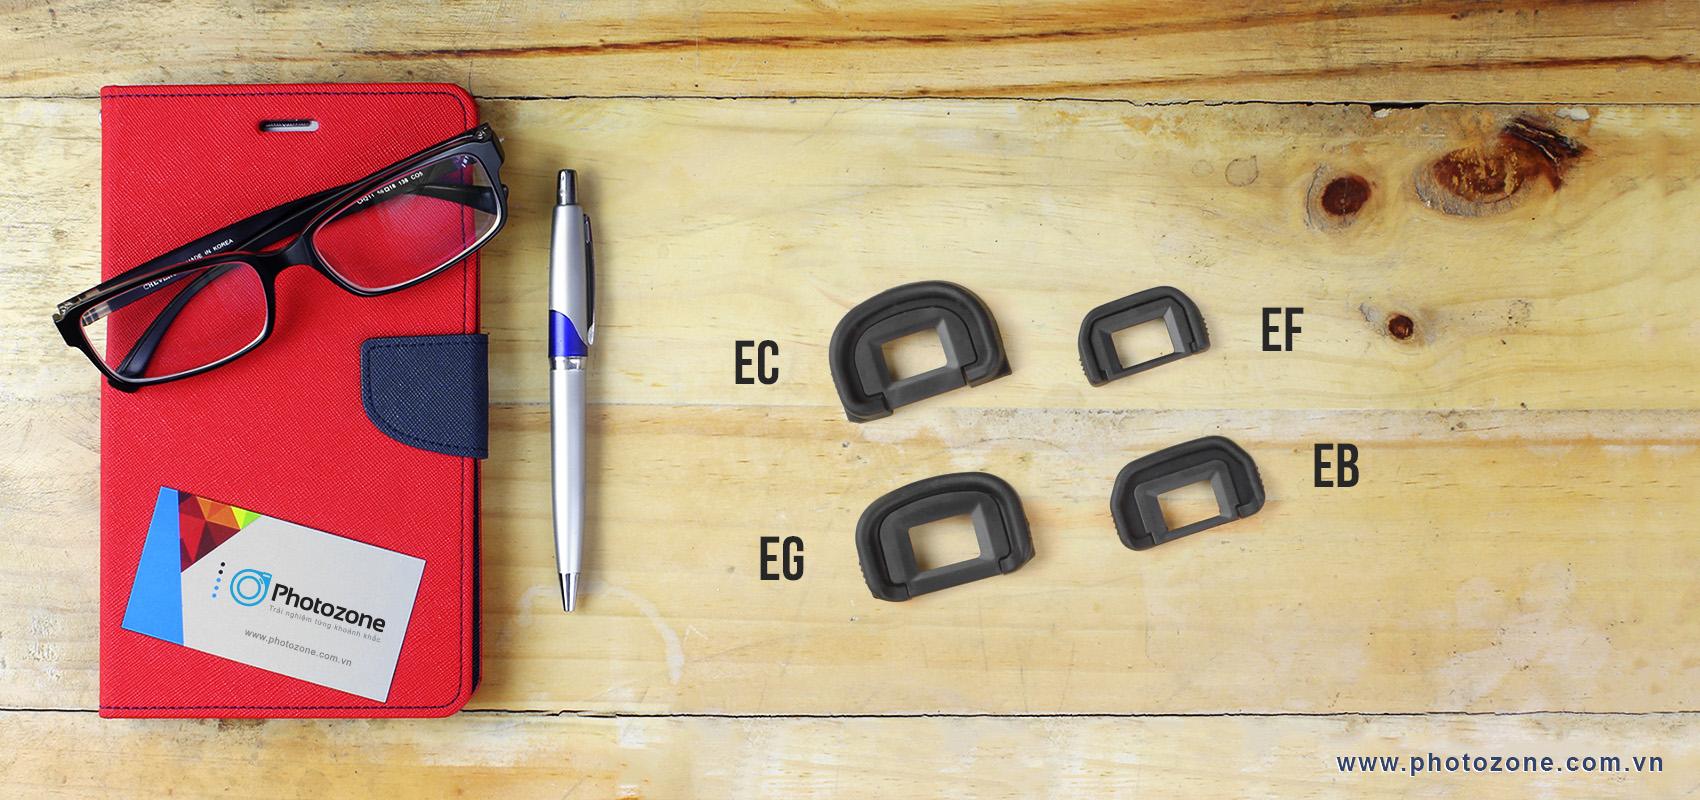 Eyecup EF màu trắng for Canon 100D, 350D, 450D, 500D, 550D, 600D, 650D, 700D, 750D, 760D – xxxxD…